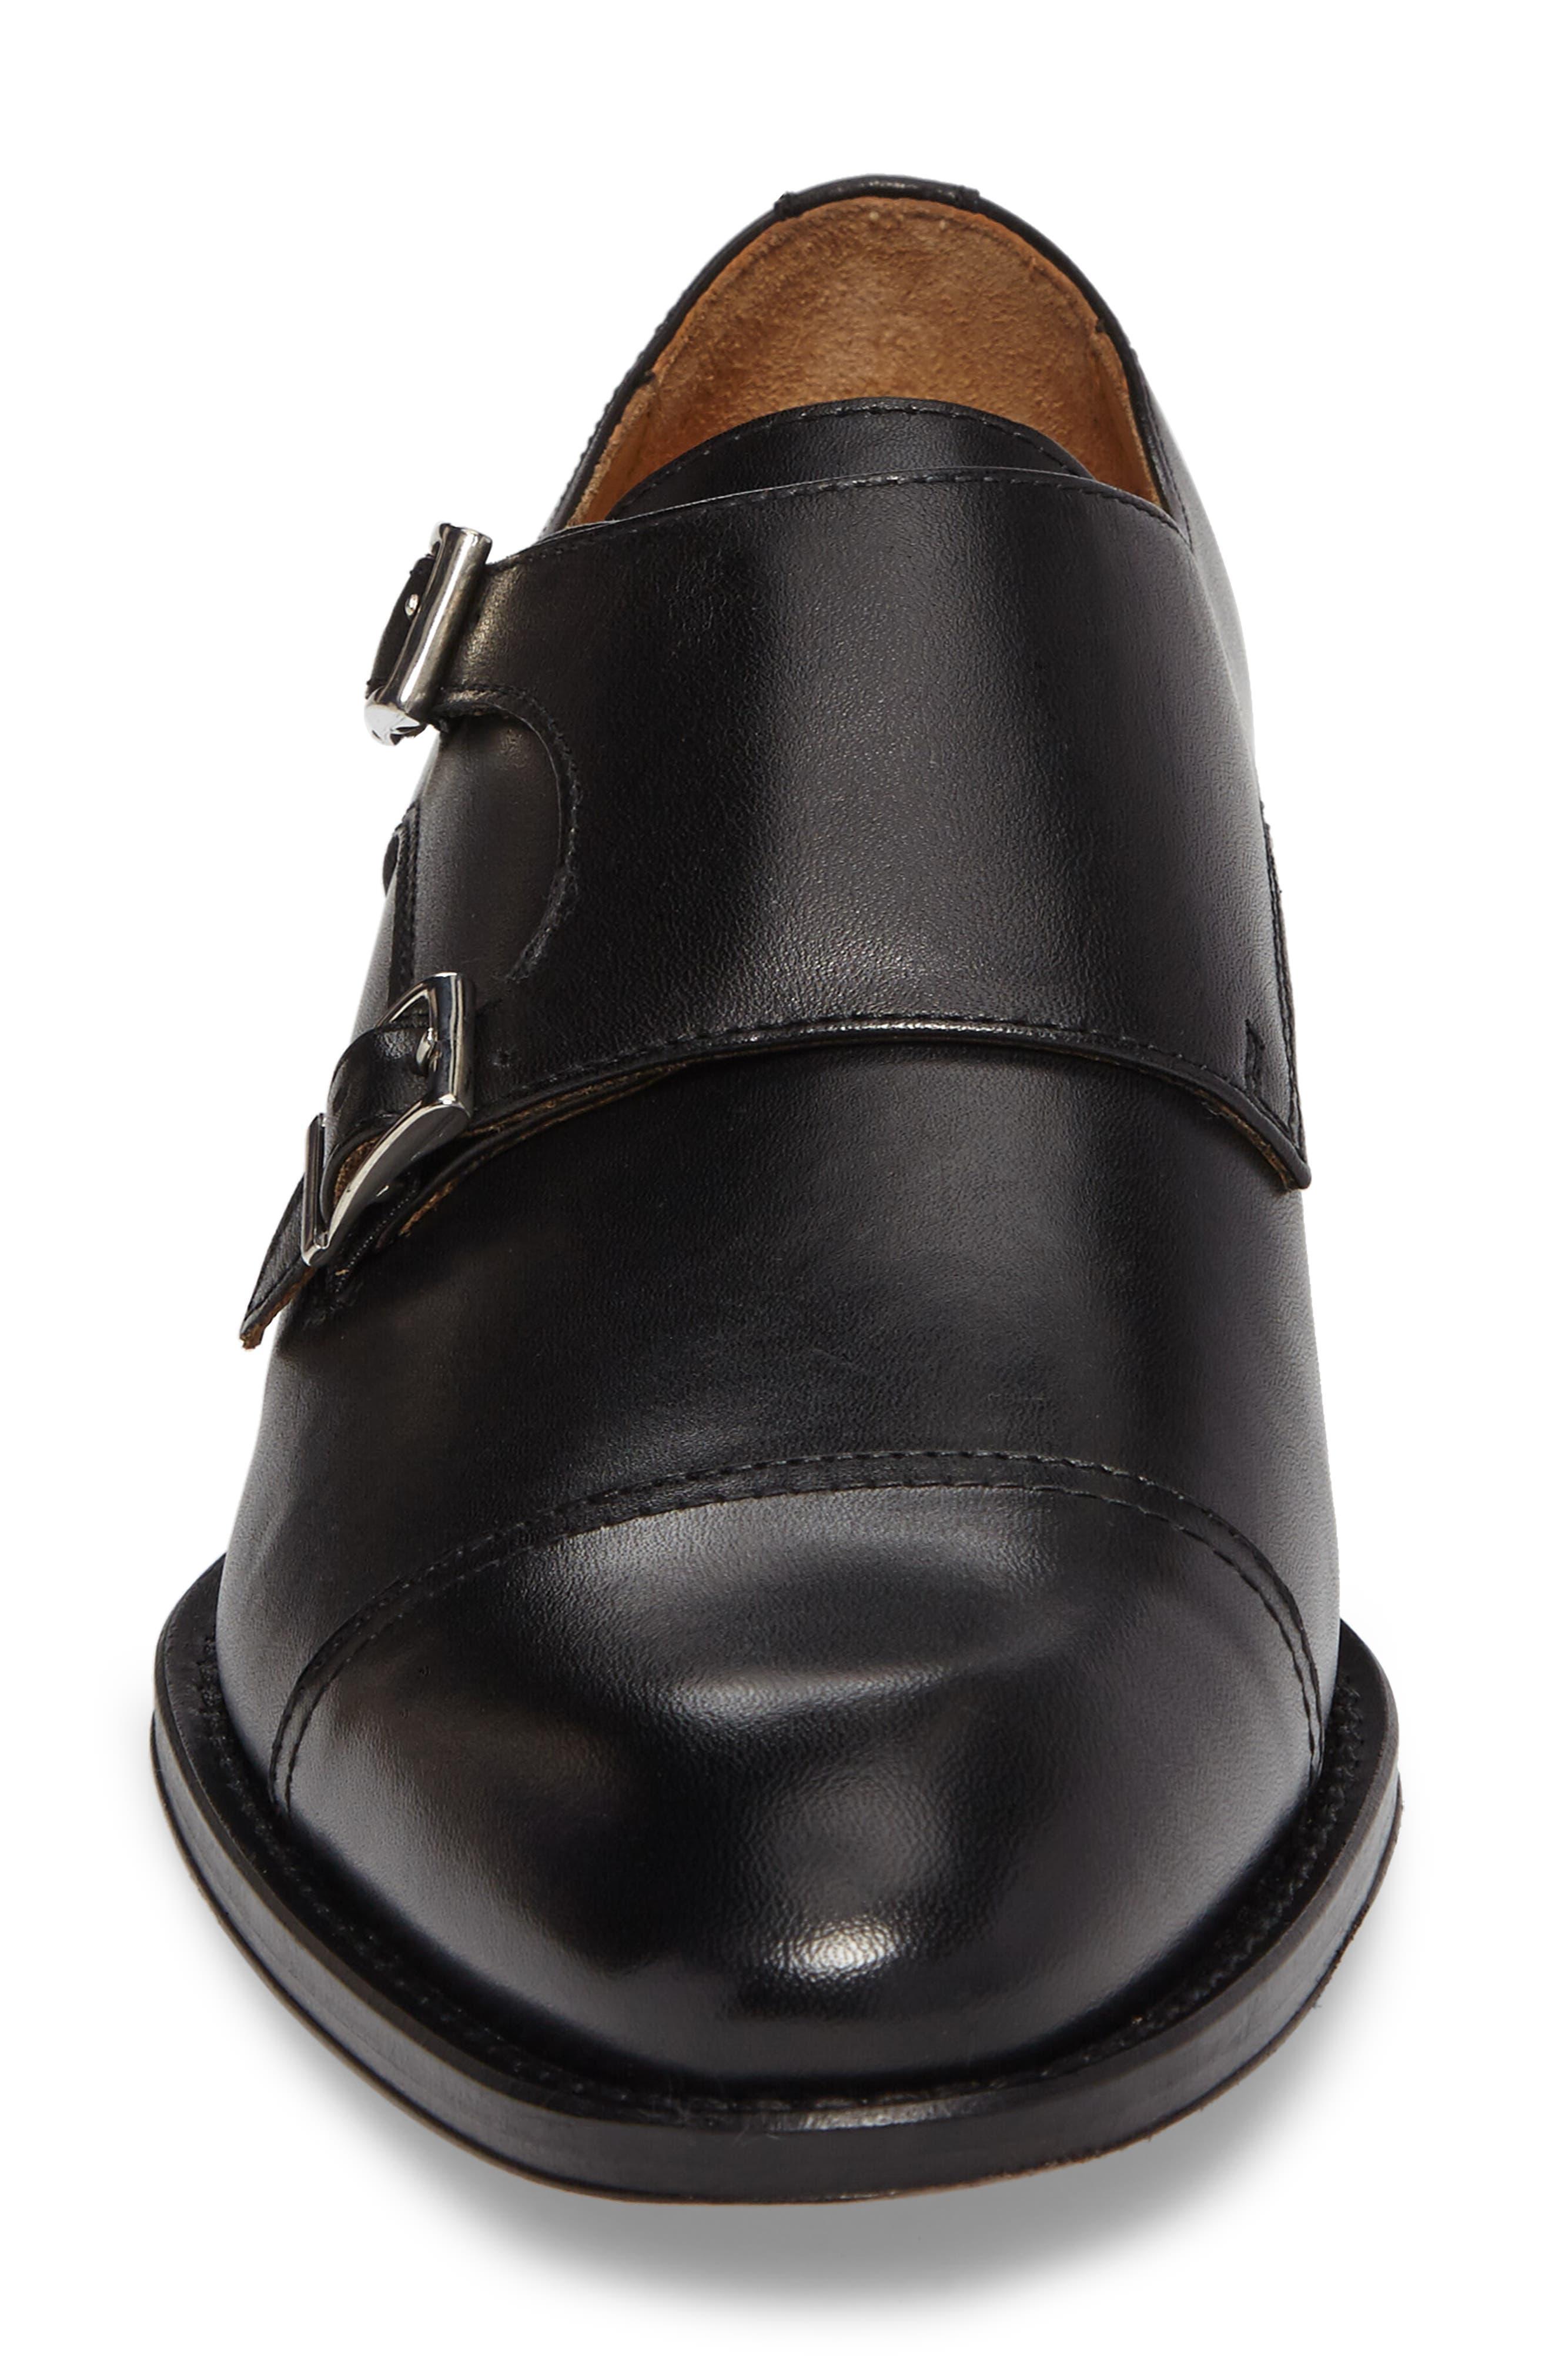 Stratton Double Monk Strap Shoe,                             Alternate thumbnail 4, color,                             001